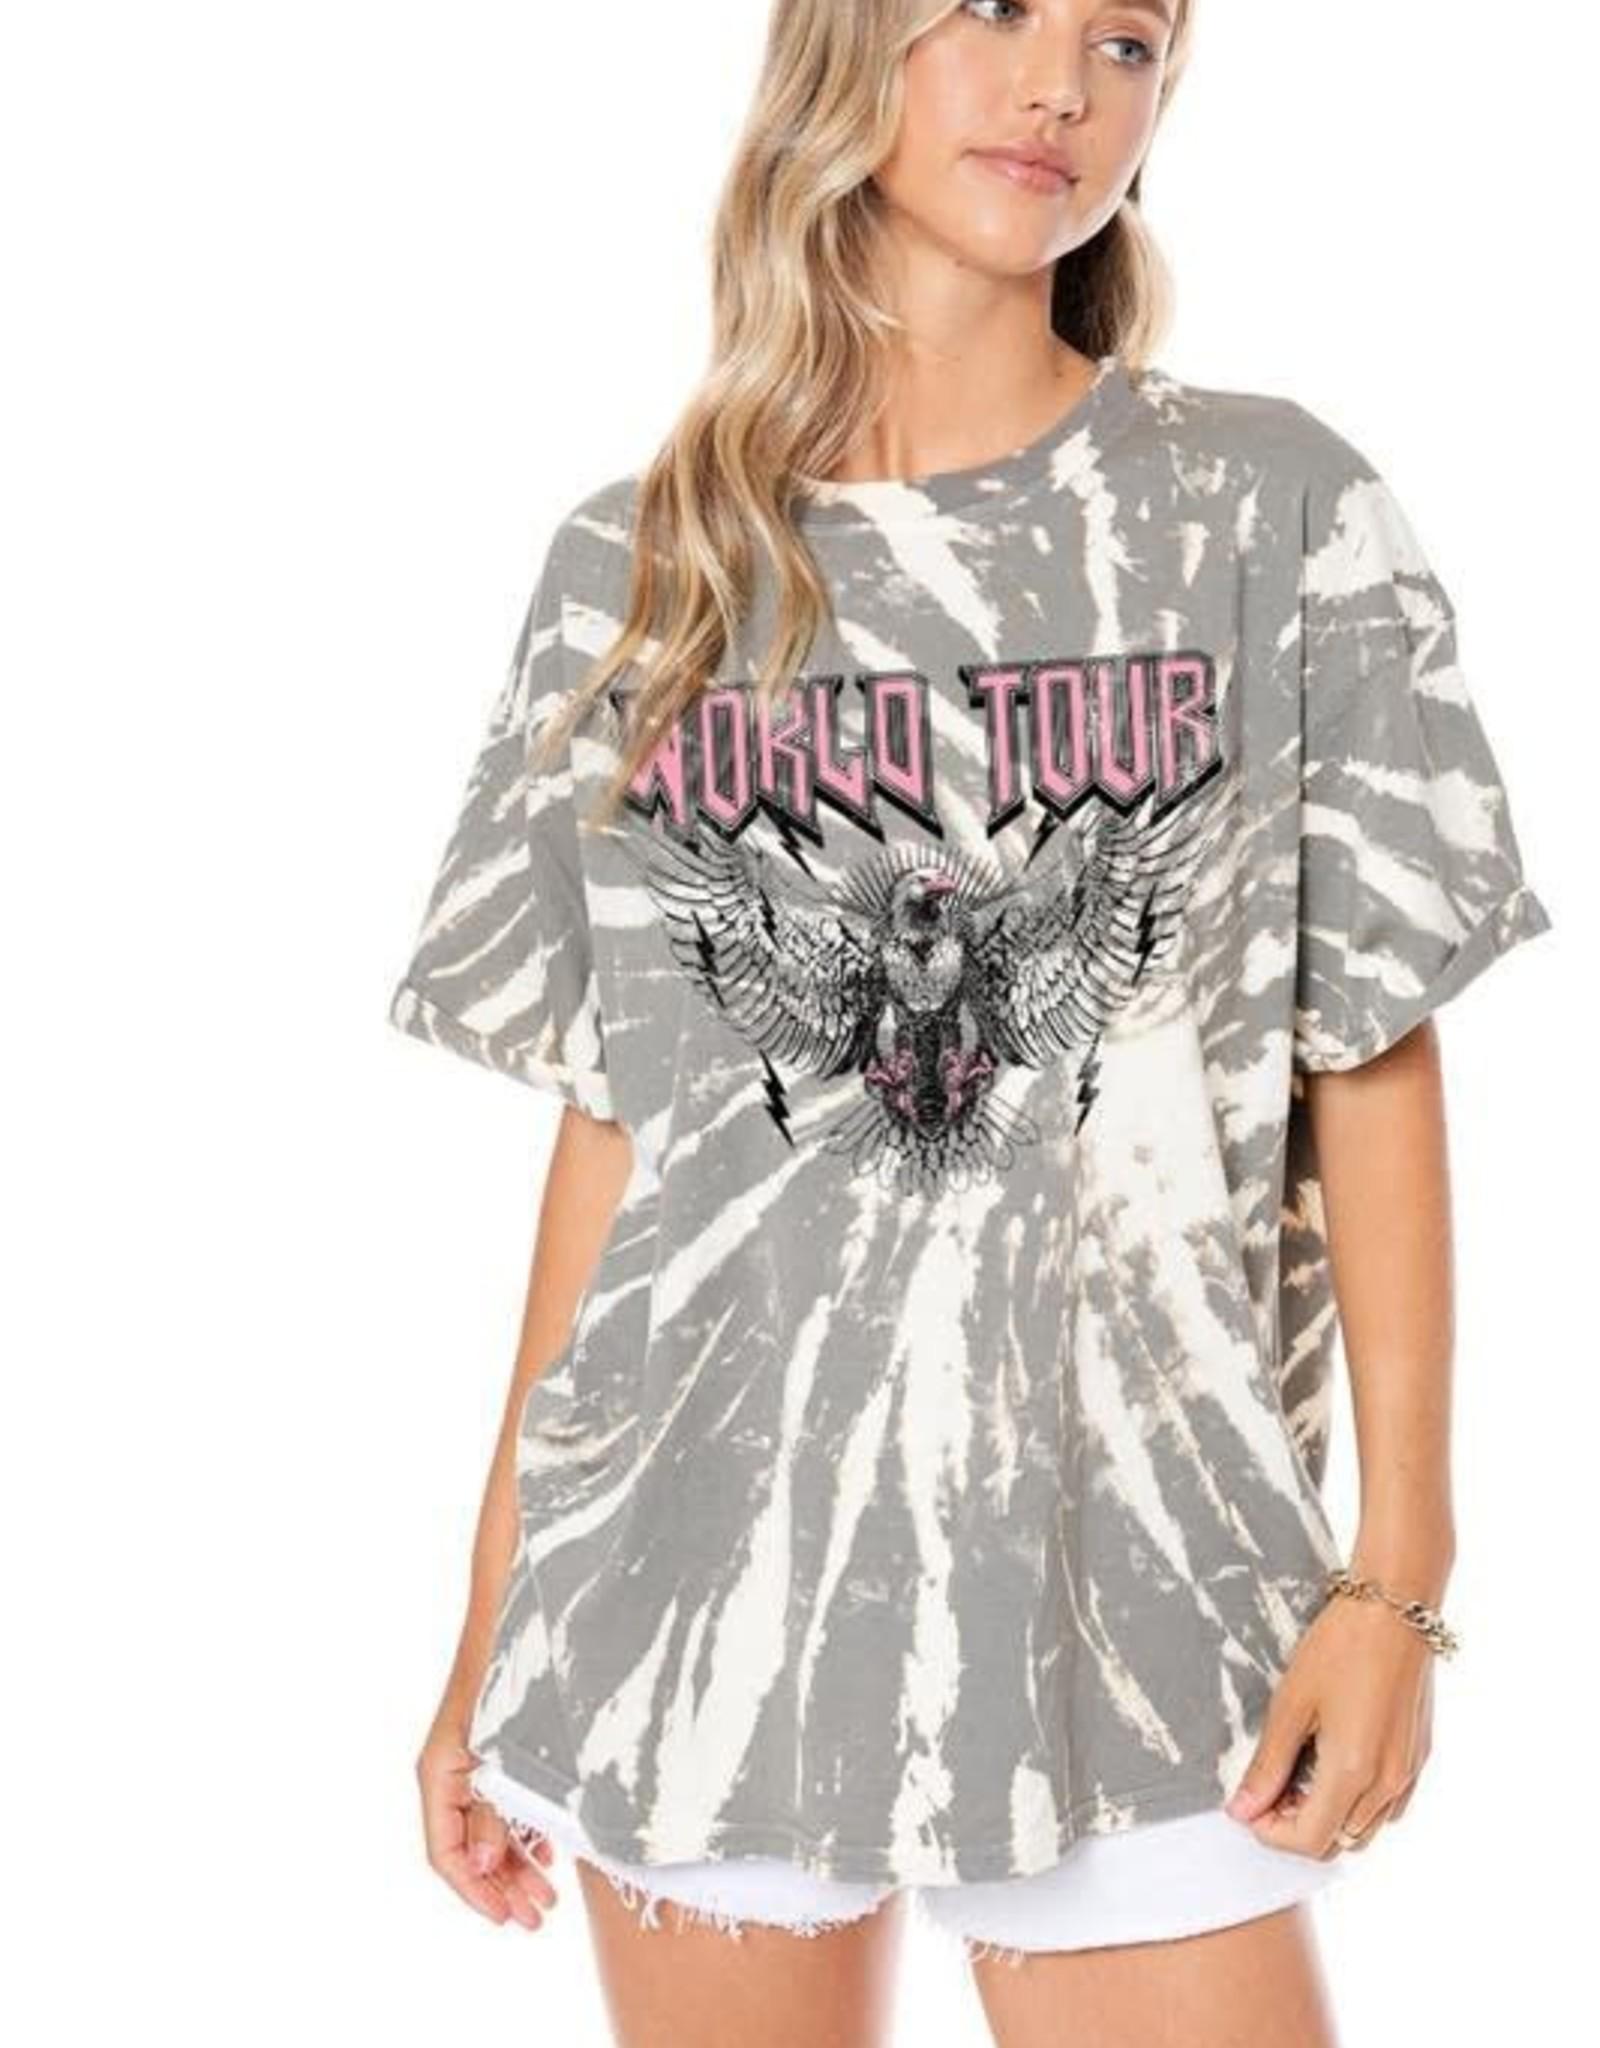 World Tour Eagle Graphic Tie Dye Top